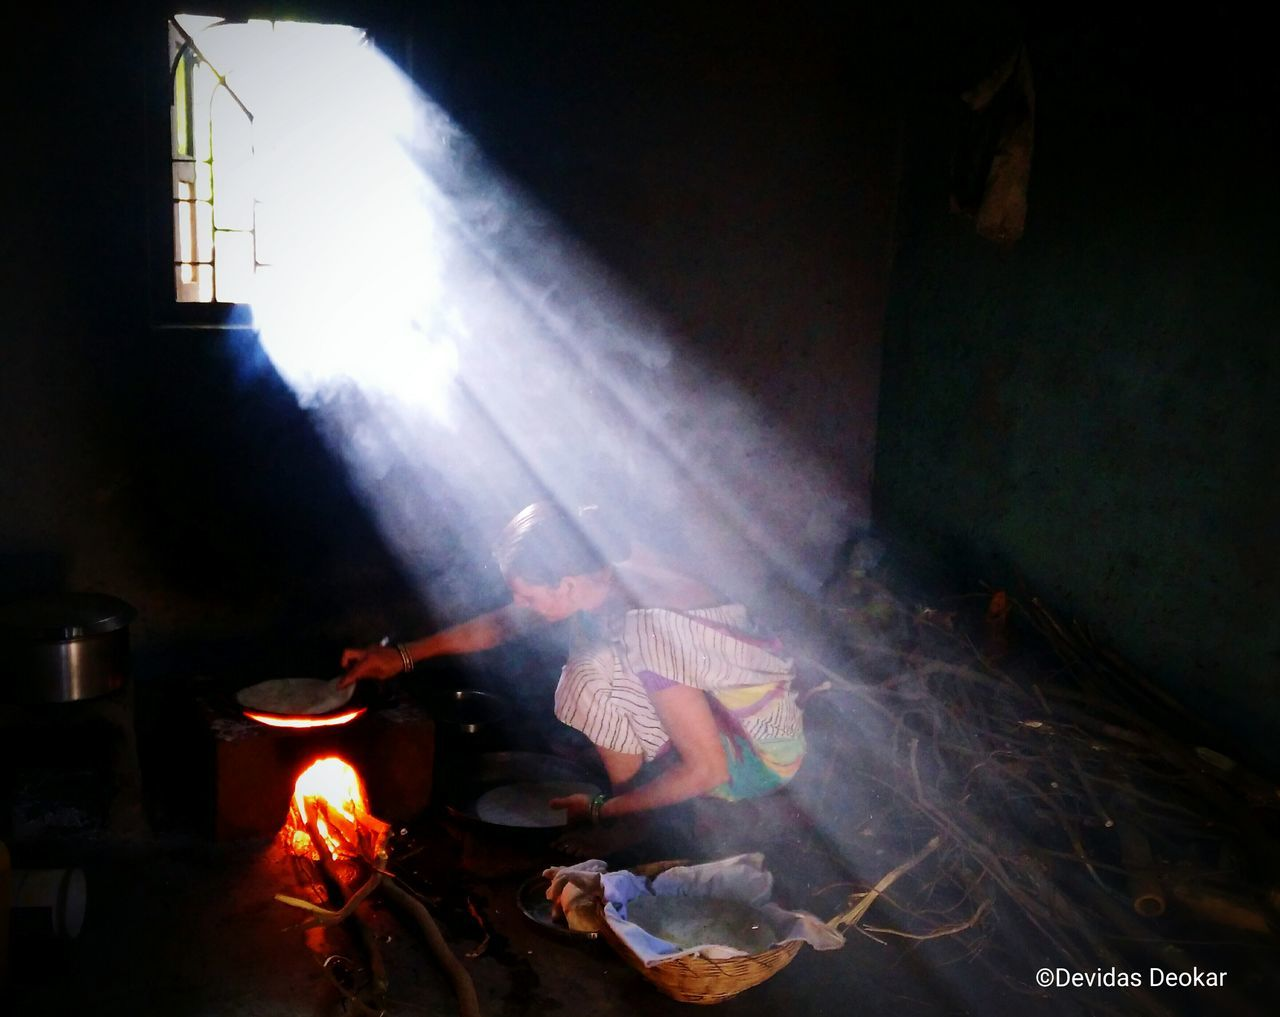 Sunrays Morning Roti Fire Fireplace Riceroti Nubia Nubiaz9mini Mobilephotography Mobile_photographer Food Makingfood Smoke Window